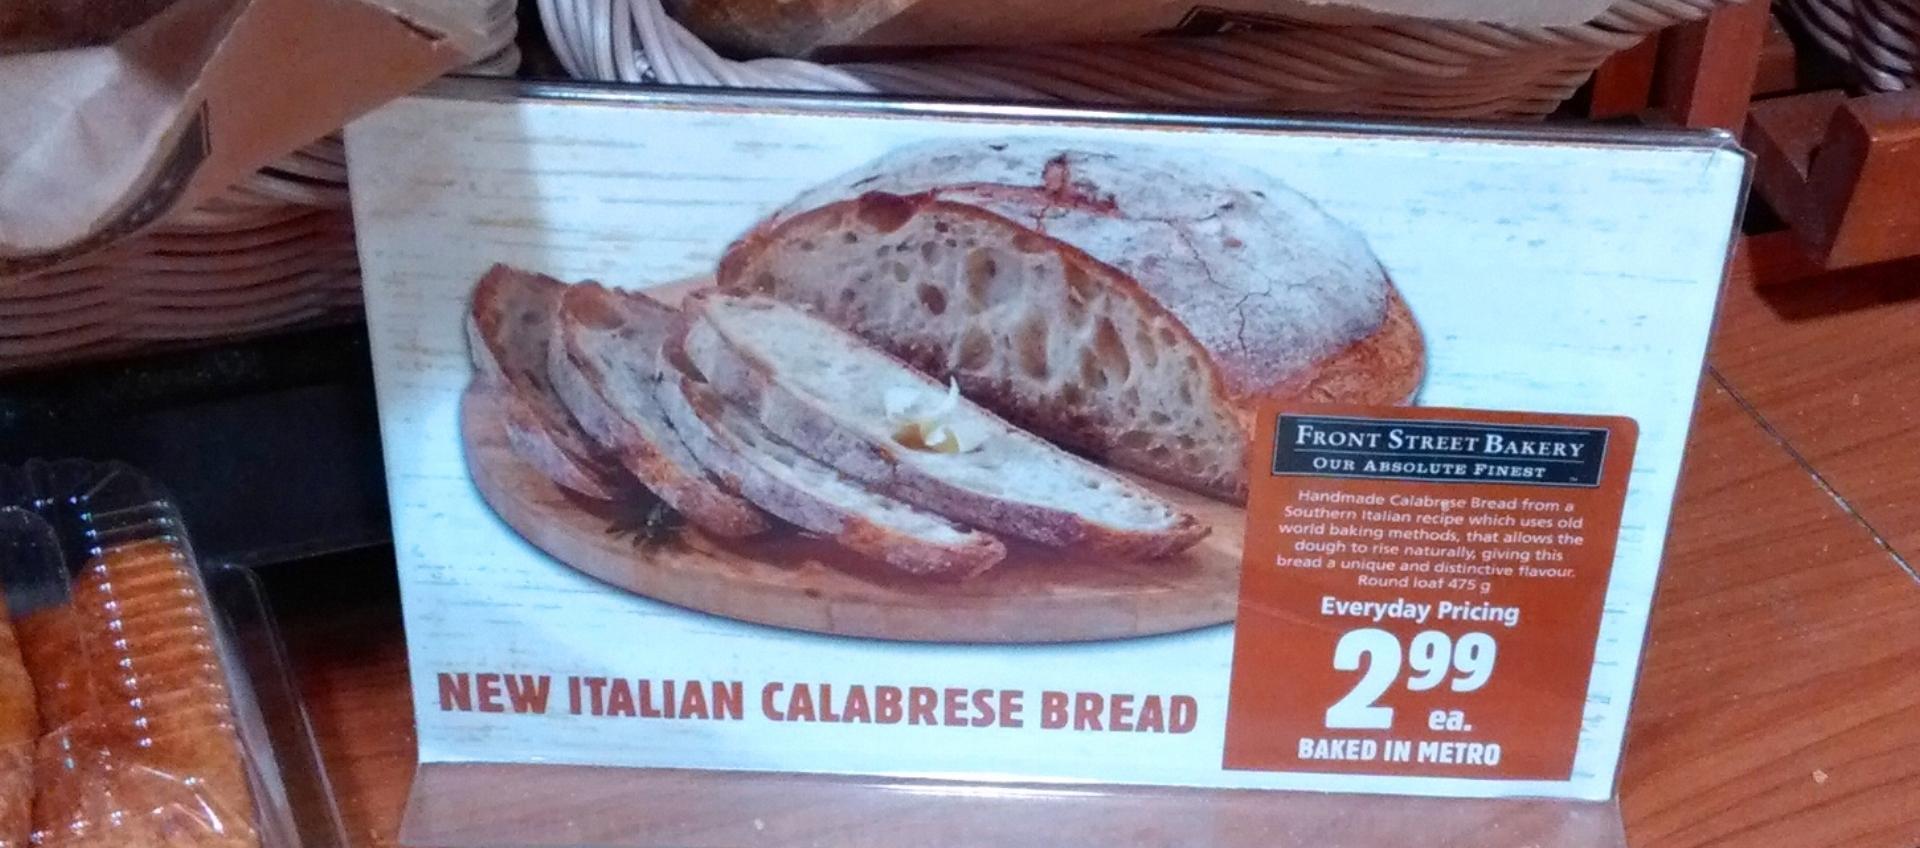 new italian calabrese bread - Kingston, Ontario, Canada.jpg